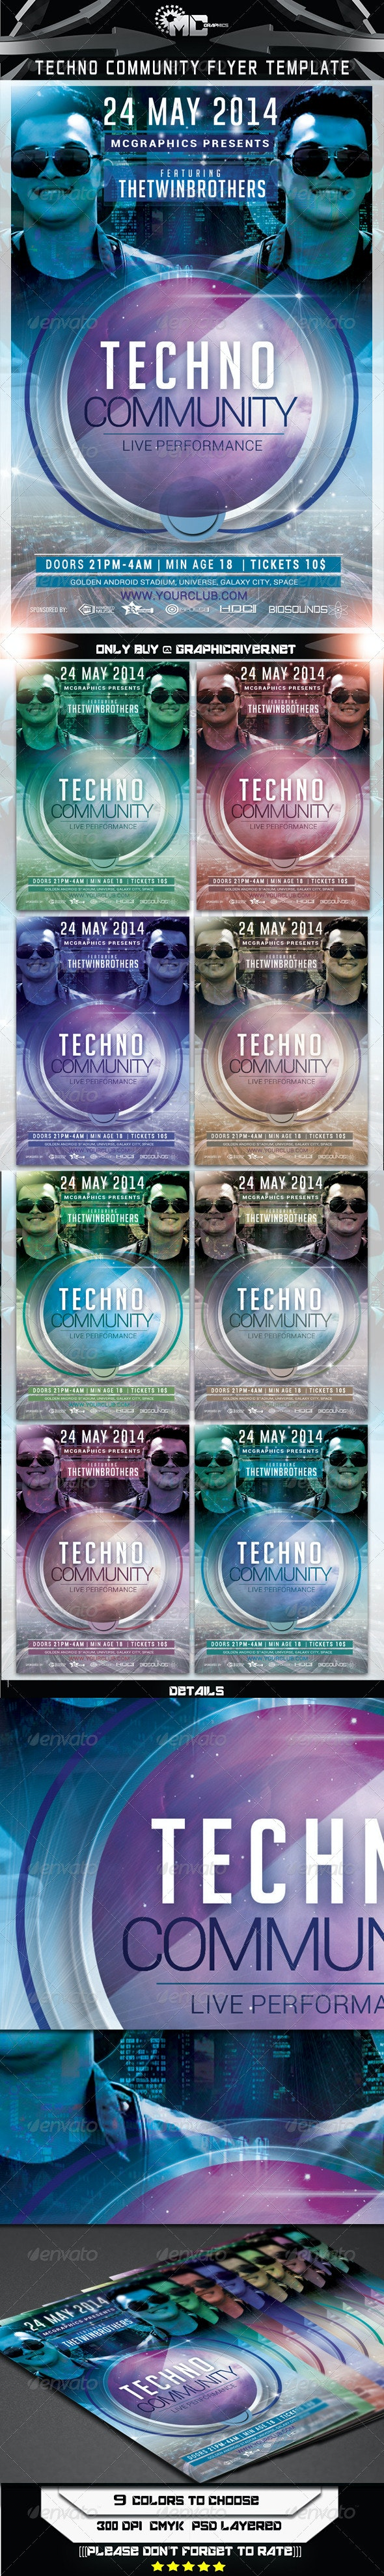 Techno Community Flyer Template - Flyers Print Templates